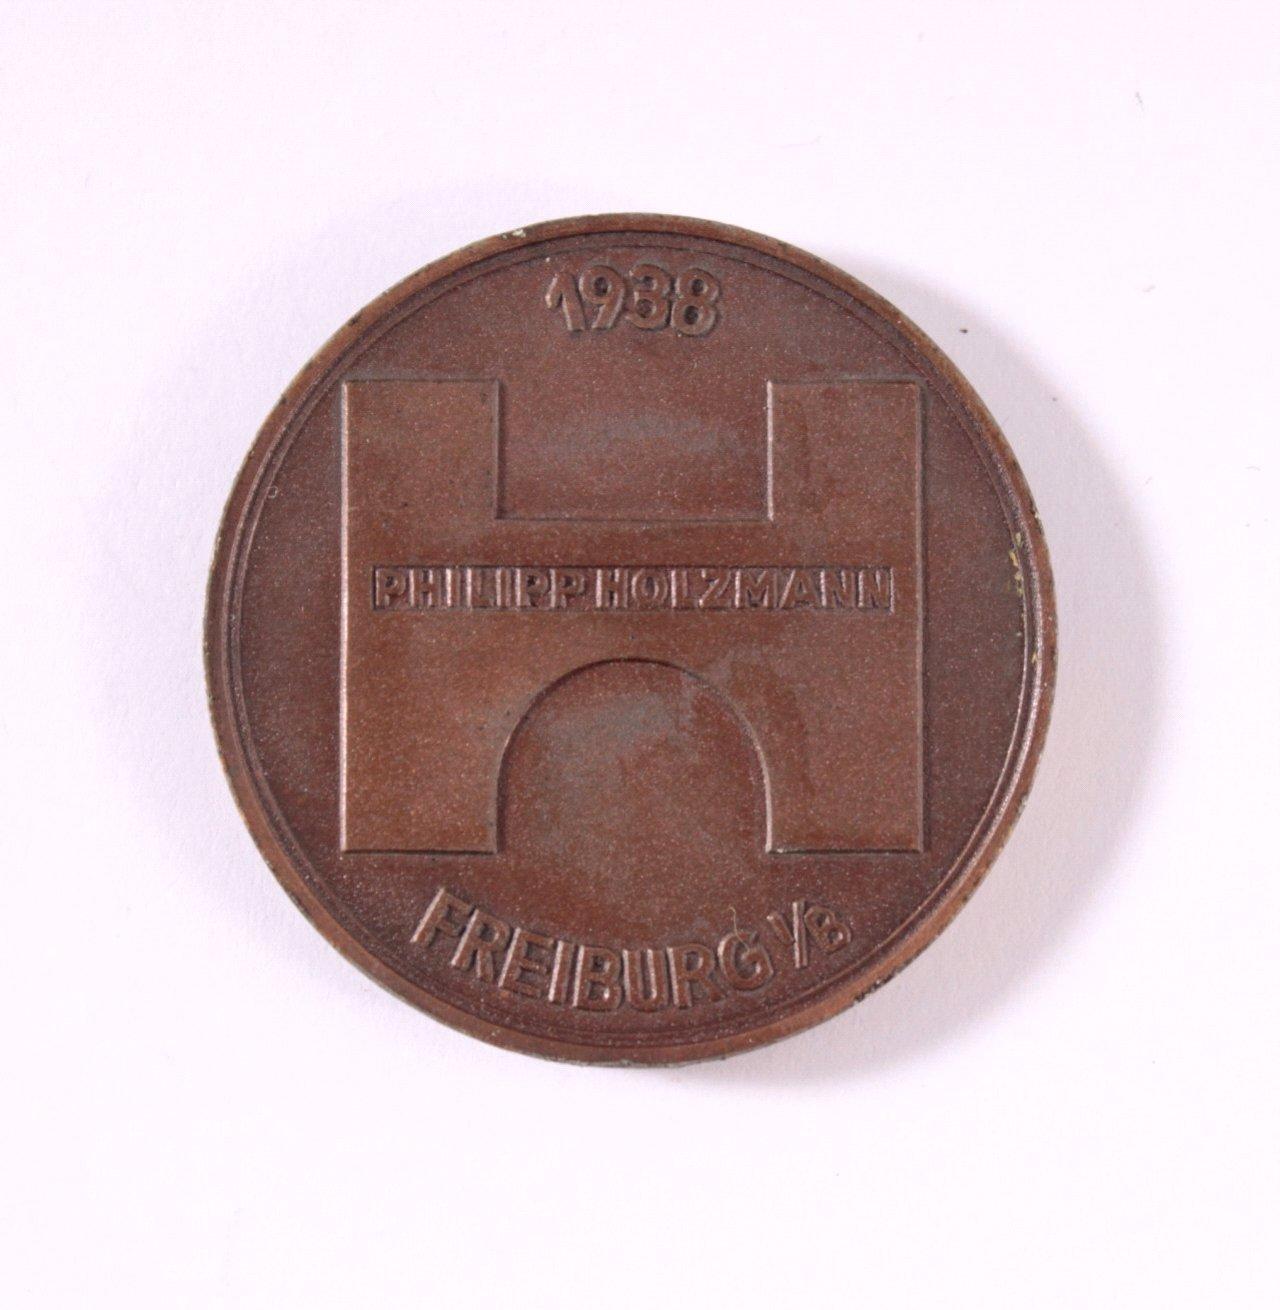 Medaille Philipp Holzmann, Freiburg i/B. 1938